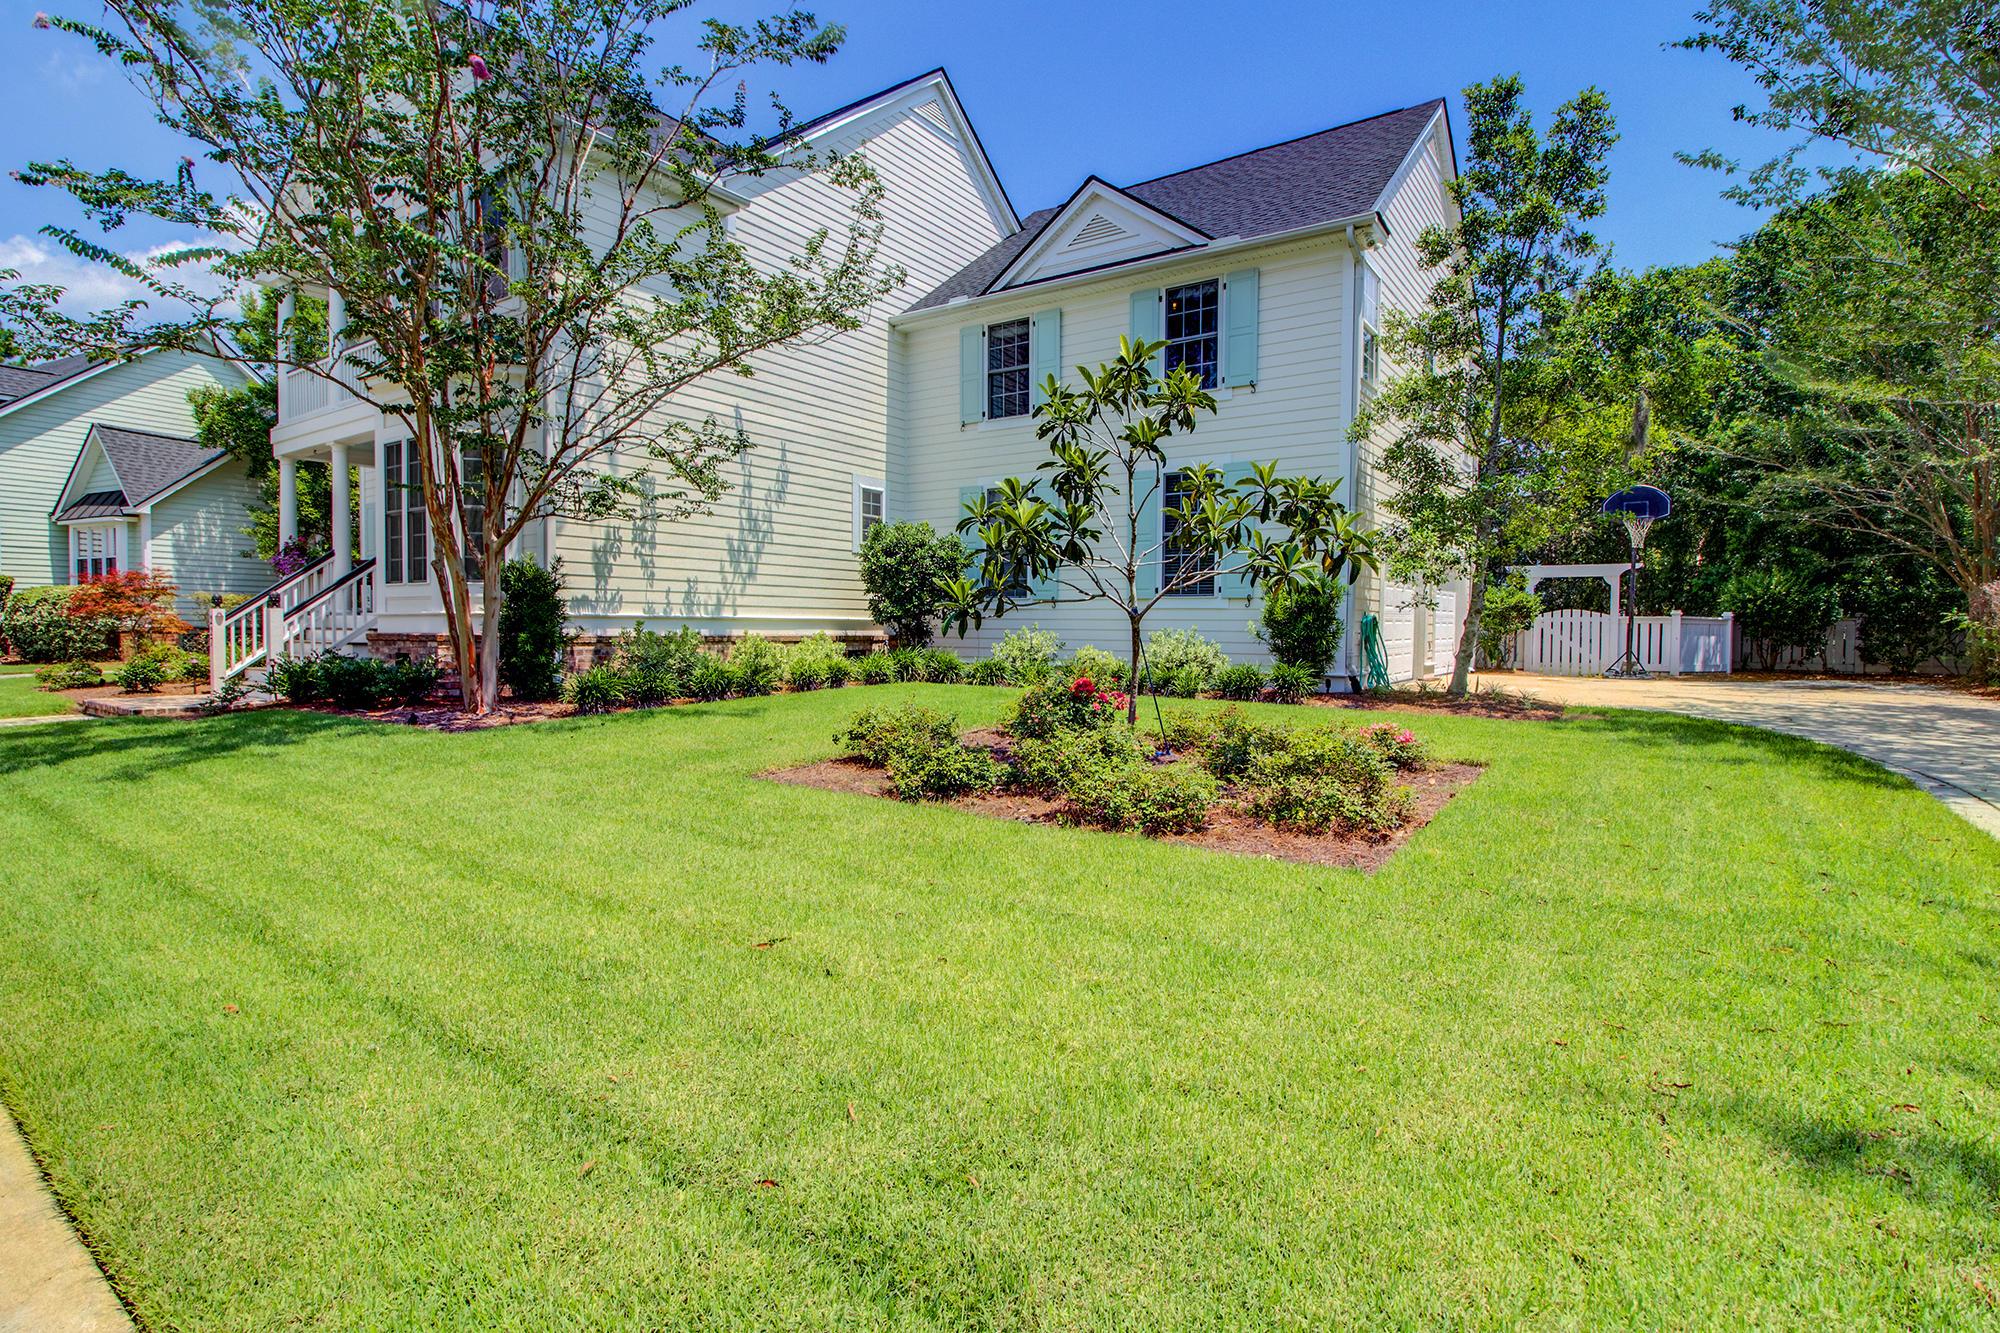 Codners Ferry Park Homes For Sale - 227 Fairchild, Daniel Island, SC - 51